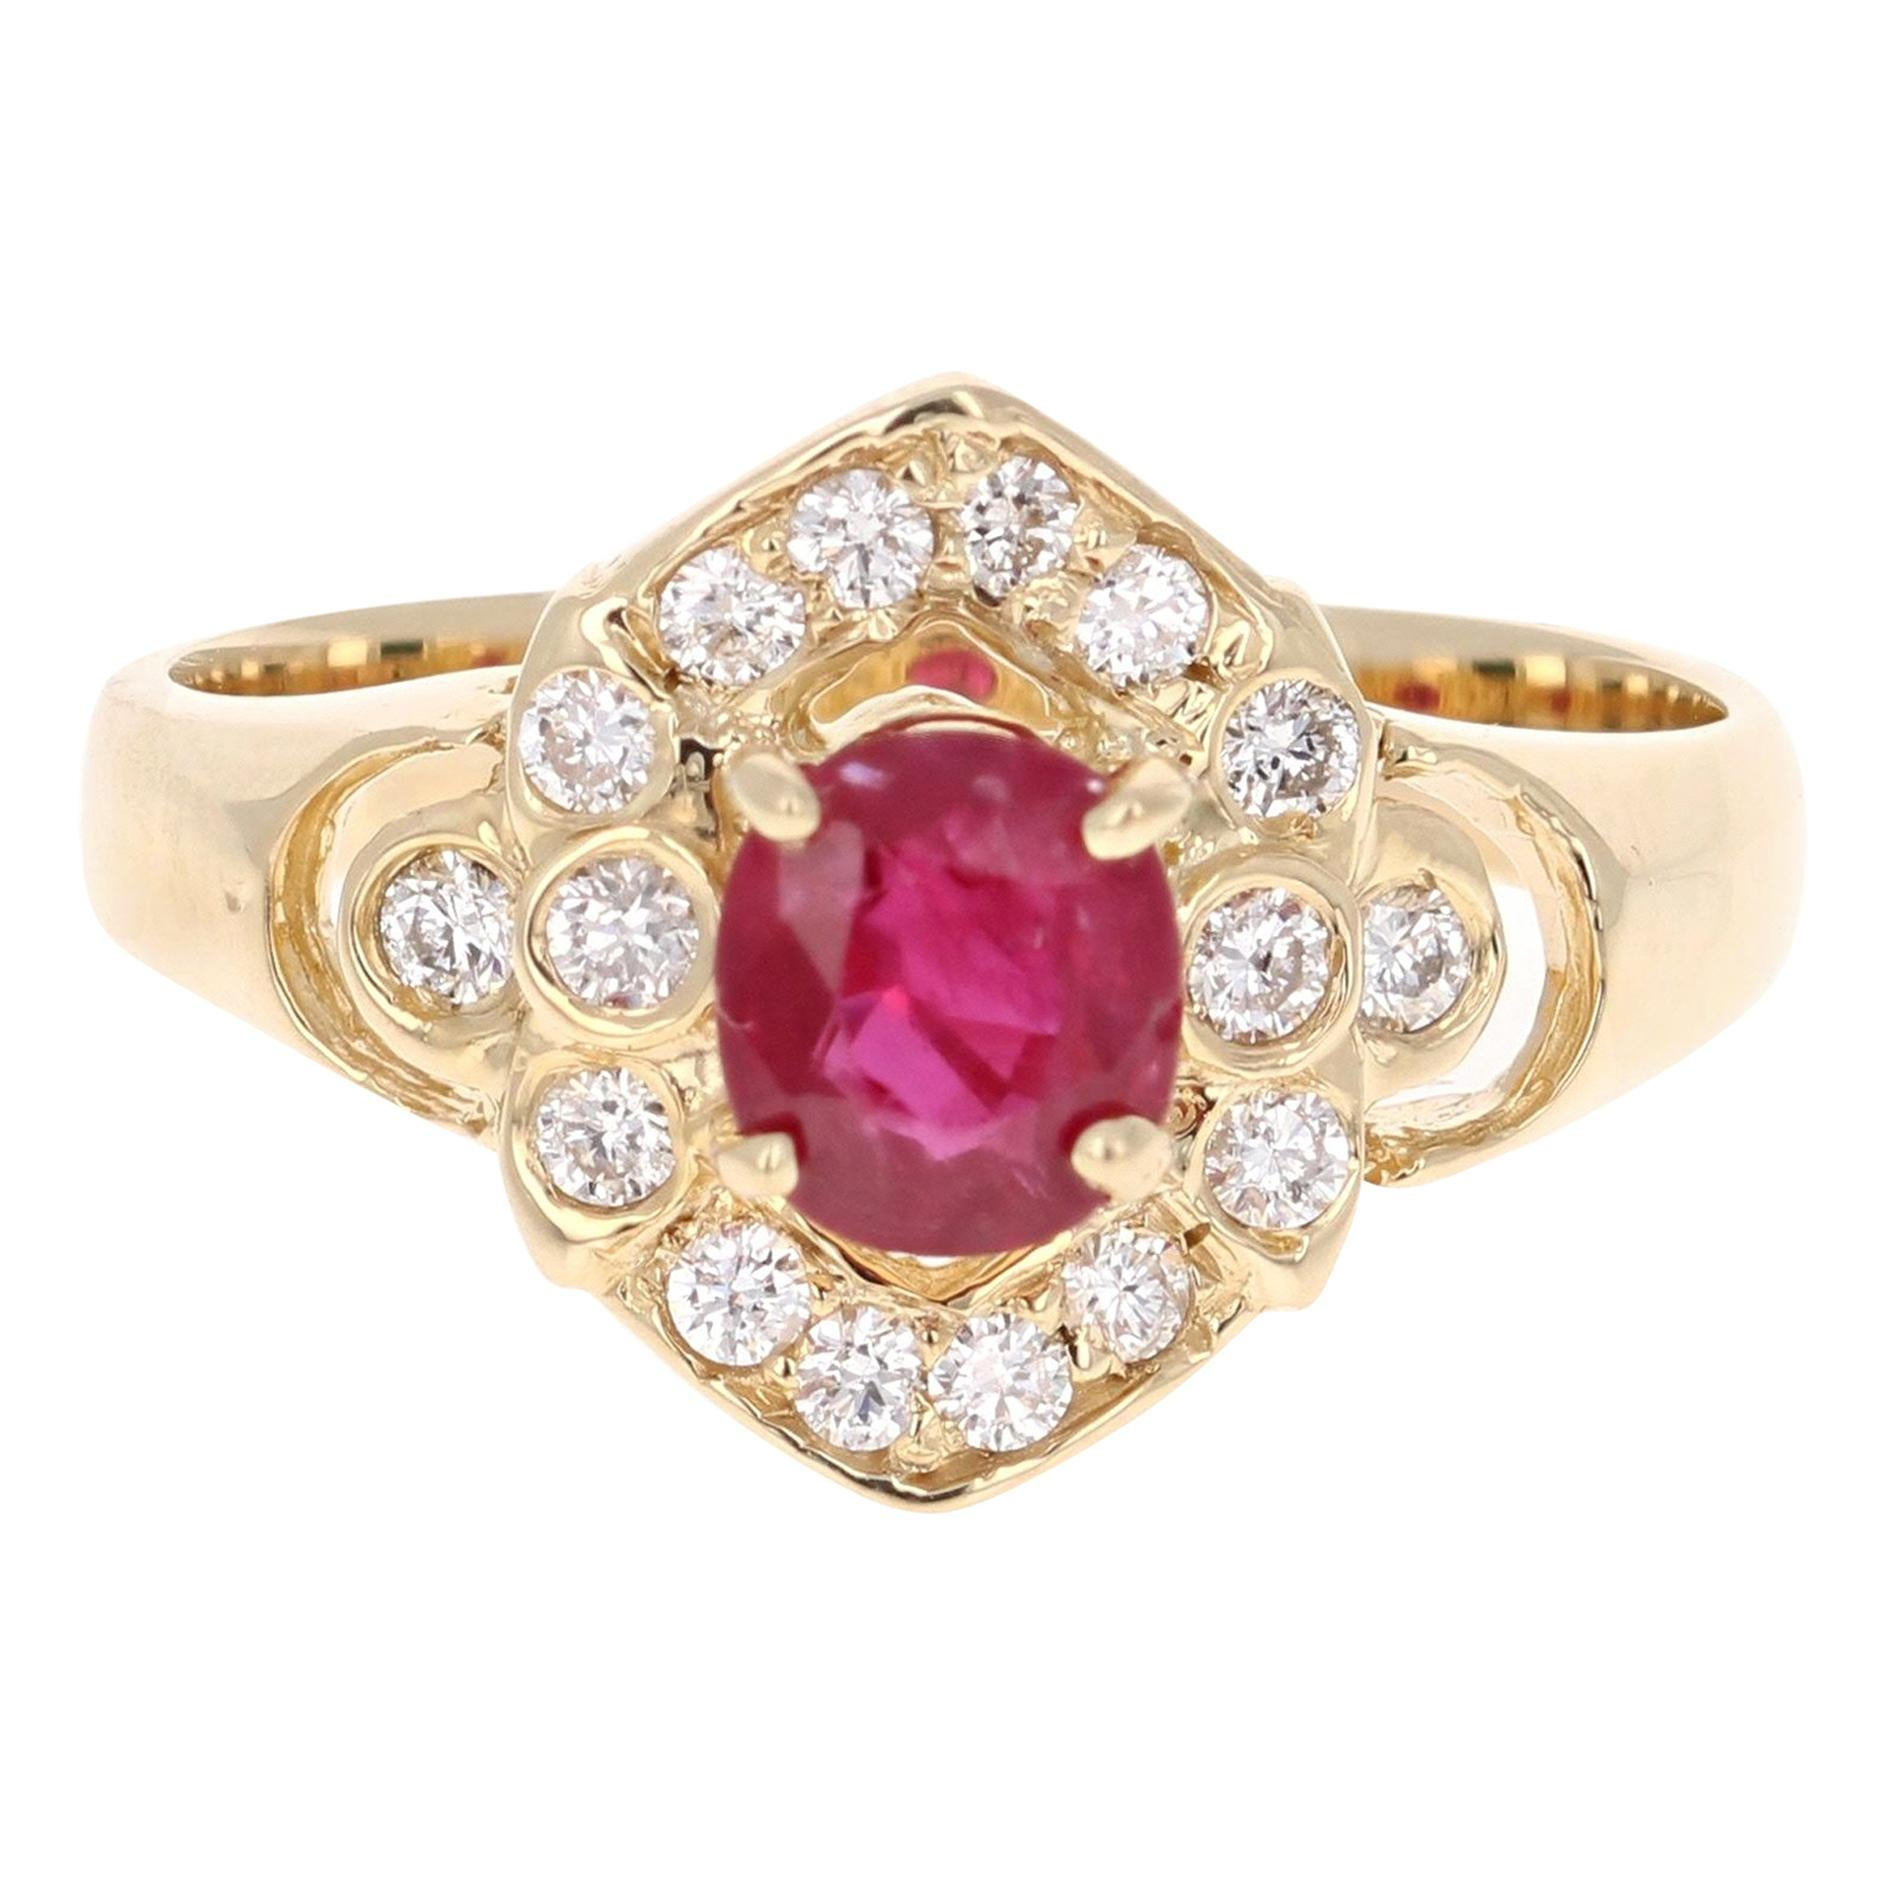 1.20 Carat Oval Cut Burmese Ruby Diamond 14 Karat Yellow Gold Cluster Ring